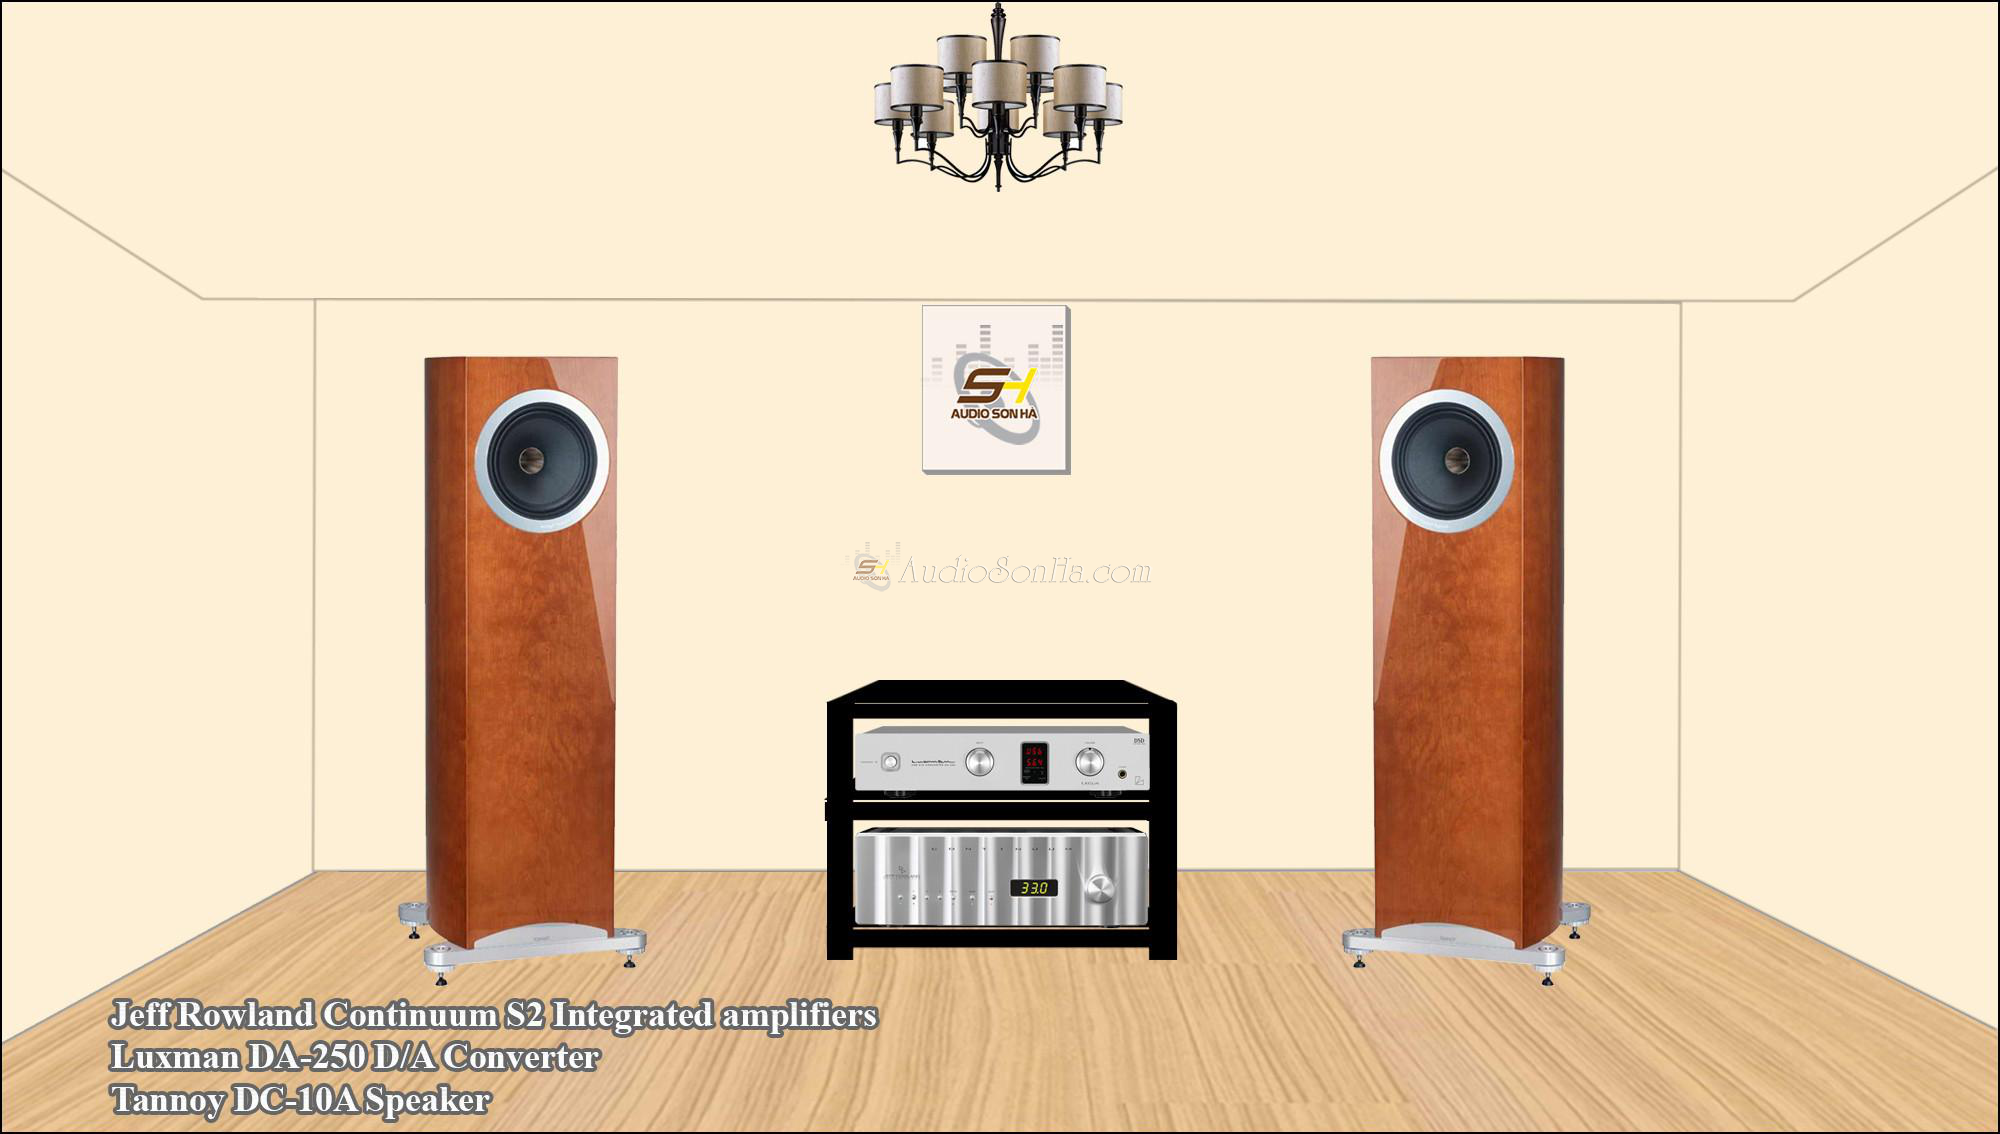 Hệ thống nghe nhạc Jeff Rowland + Tannoy